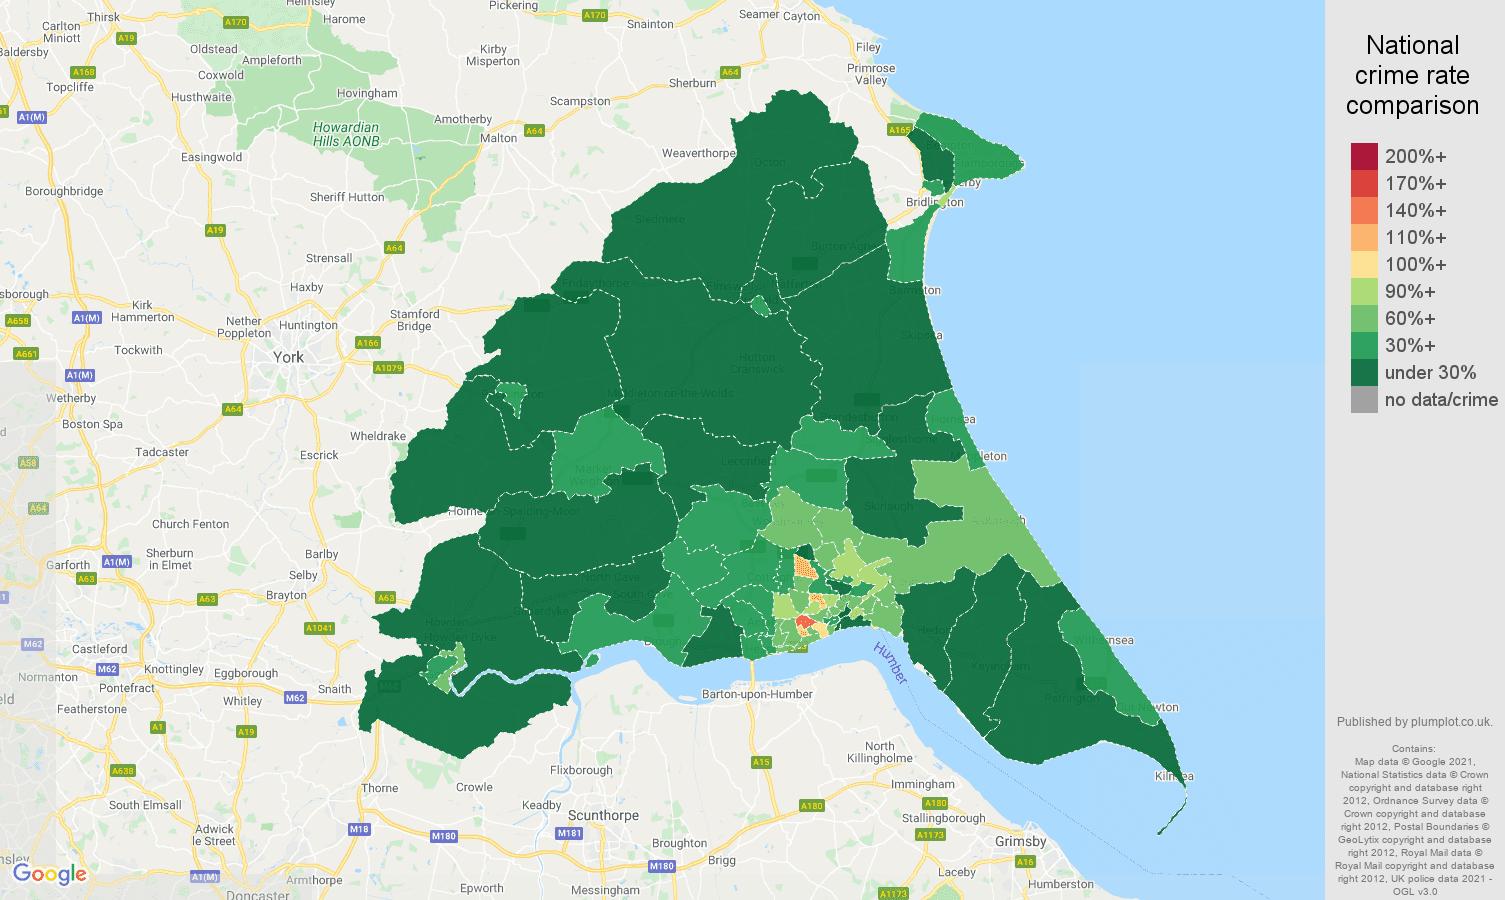 East Riding of Yorkshire antisocial behaviour crime rate comparison map